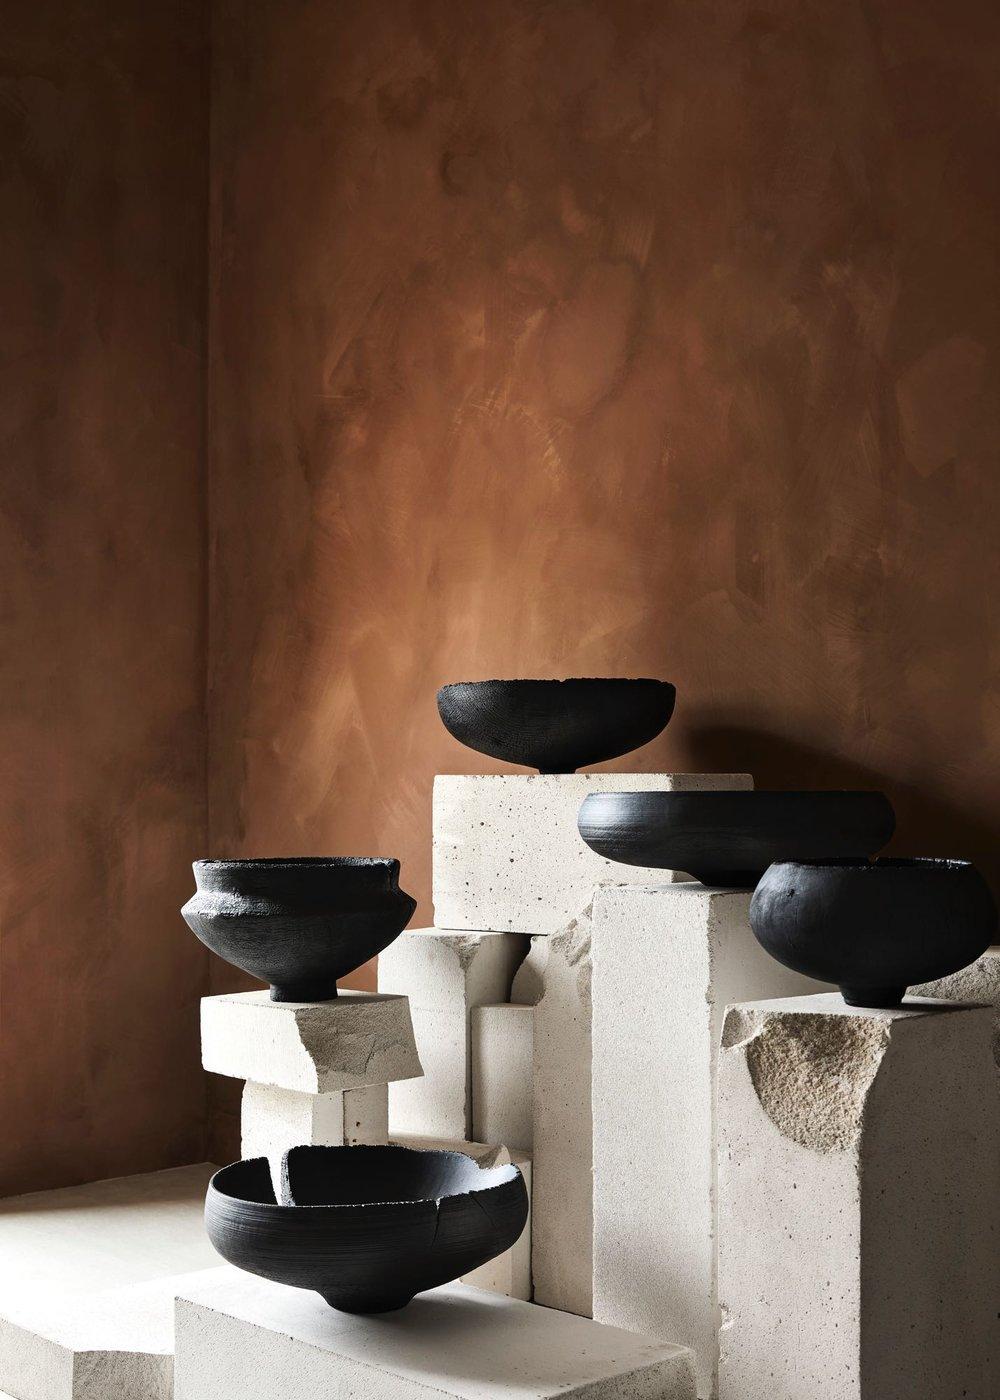 The beautiful work of Makiko Ryujin balancing on delightfully distressed plinths.